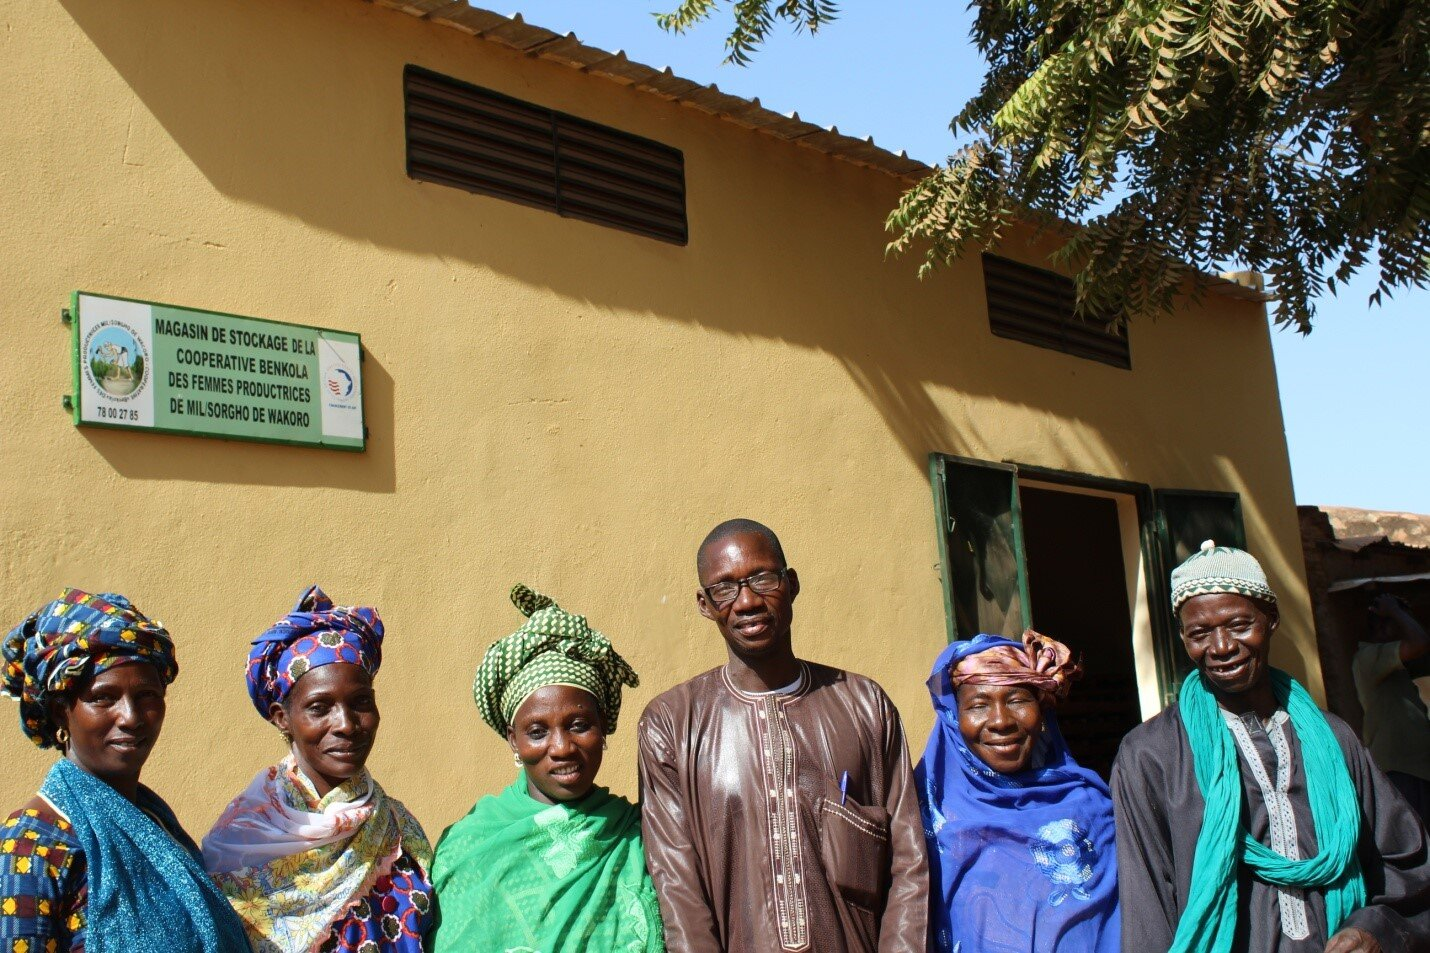 Binkola Cooperative - Wacoro Cereal Marketing Project in Mali.jpg